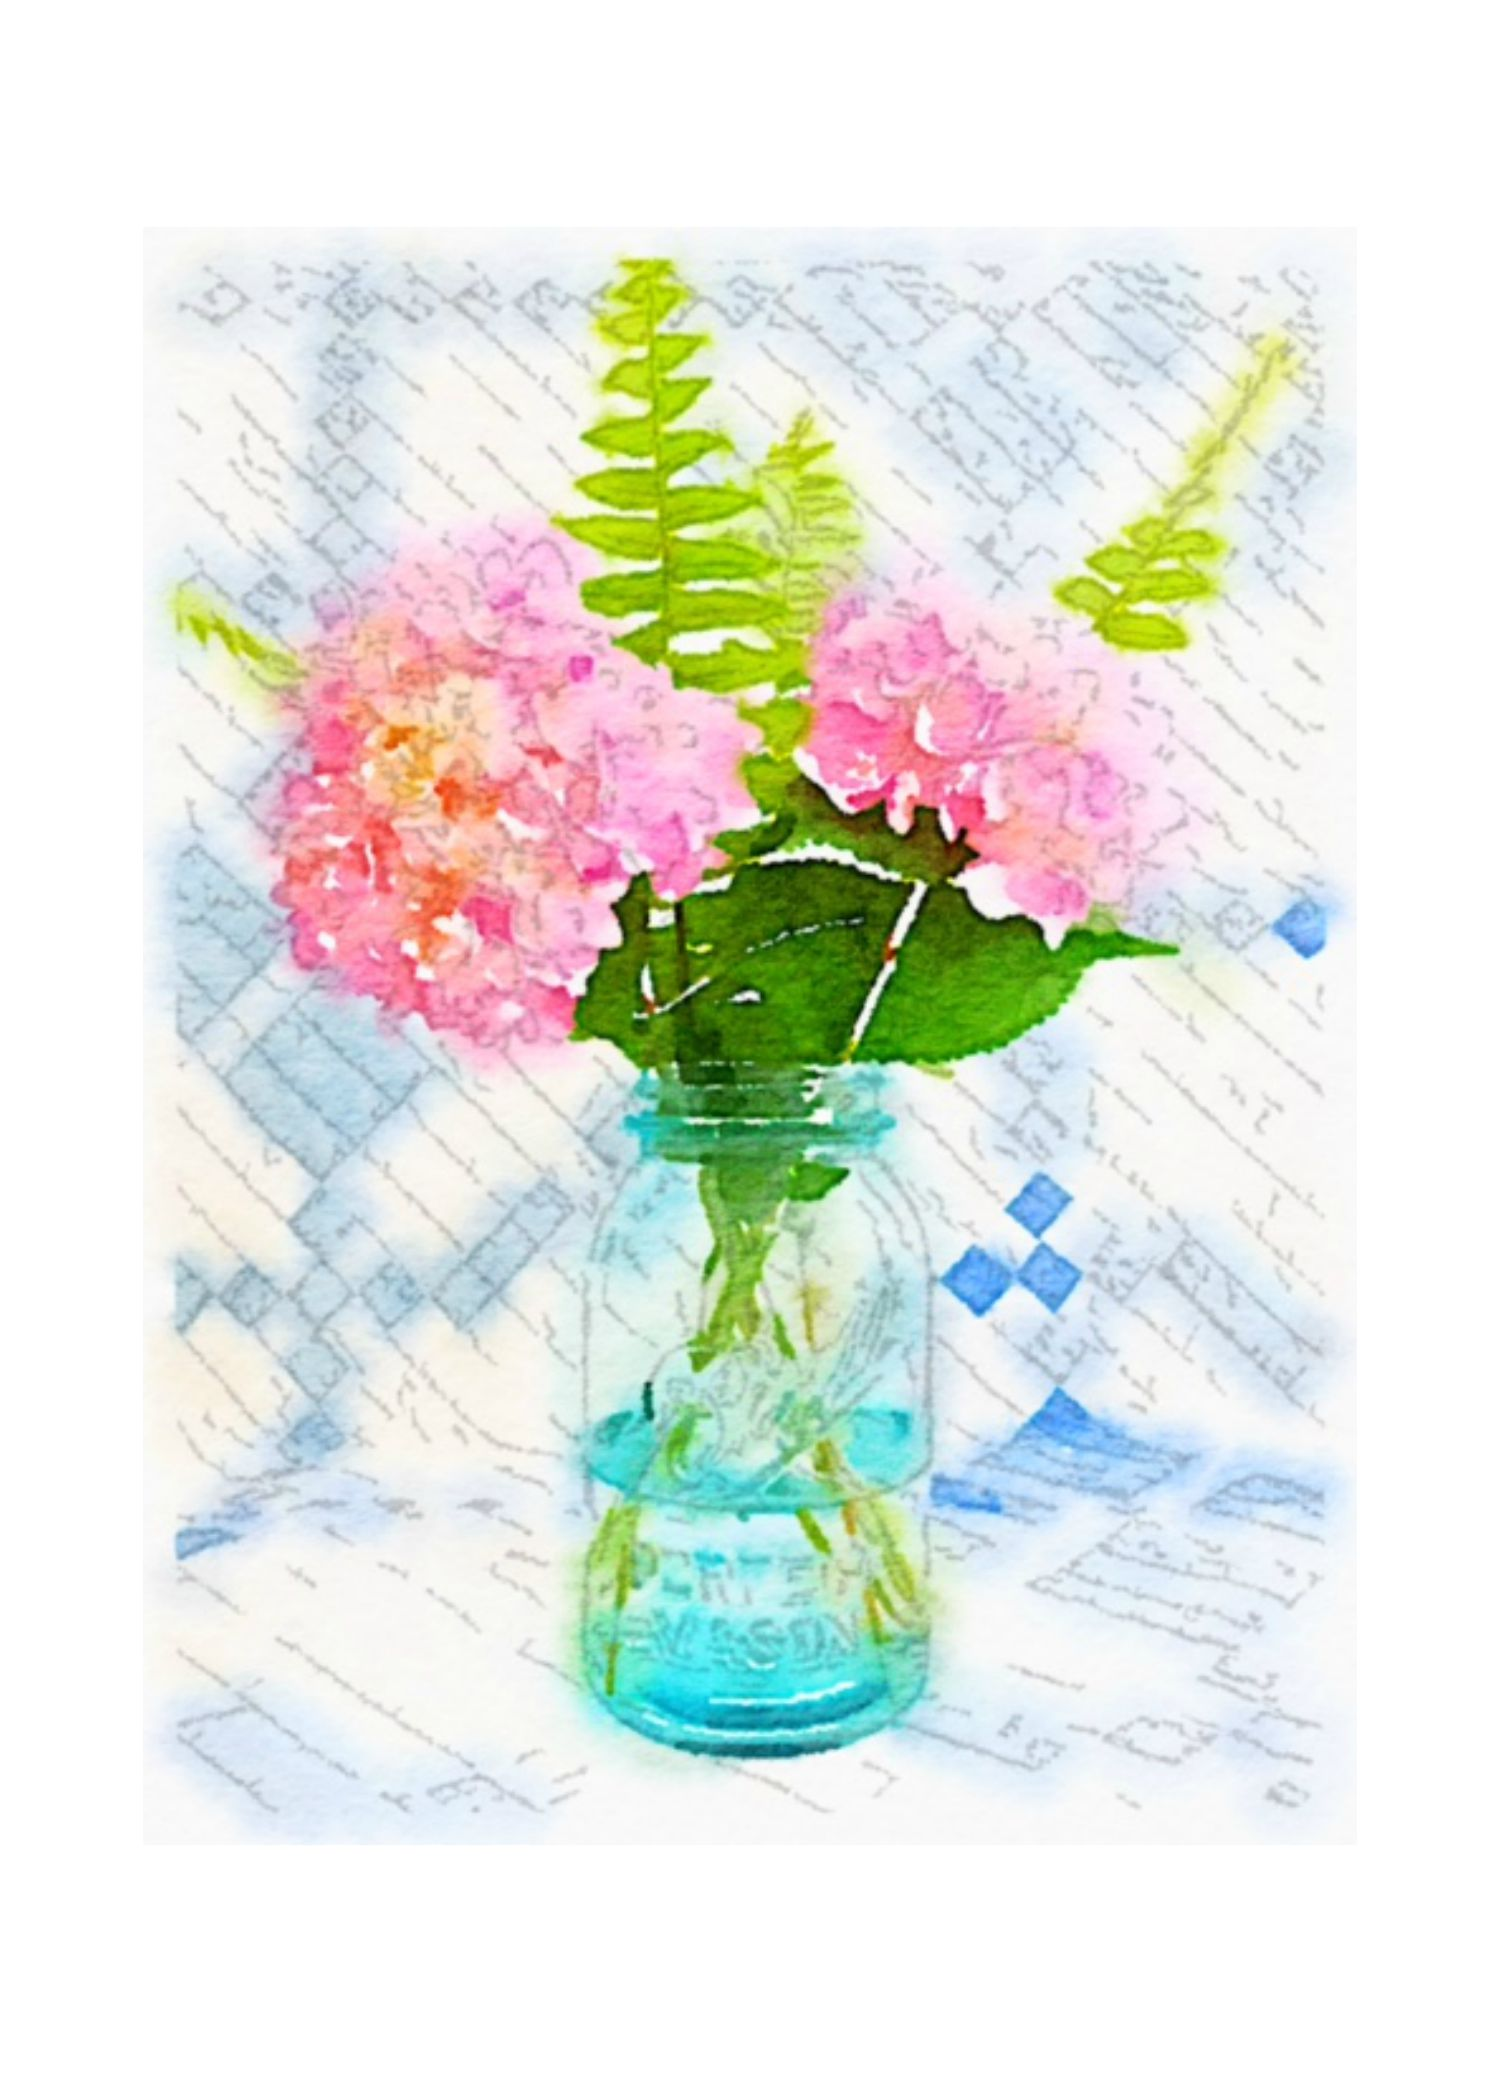 Free Summer Printables - Hydrangeas in Mason Jar Watercolor Print via On Sutton Place | https://www.roseclearfield.com